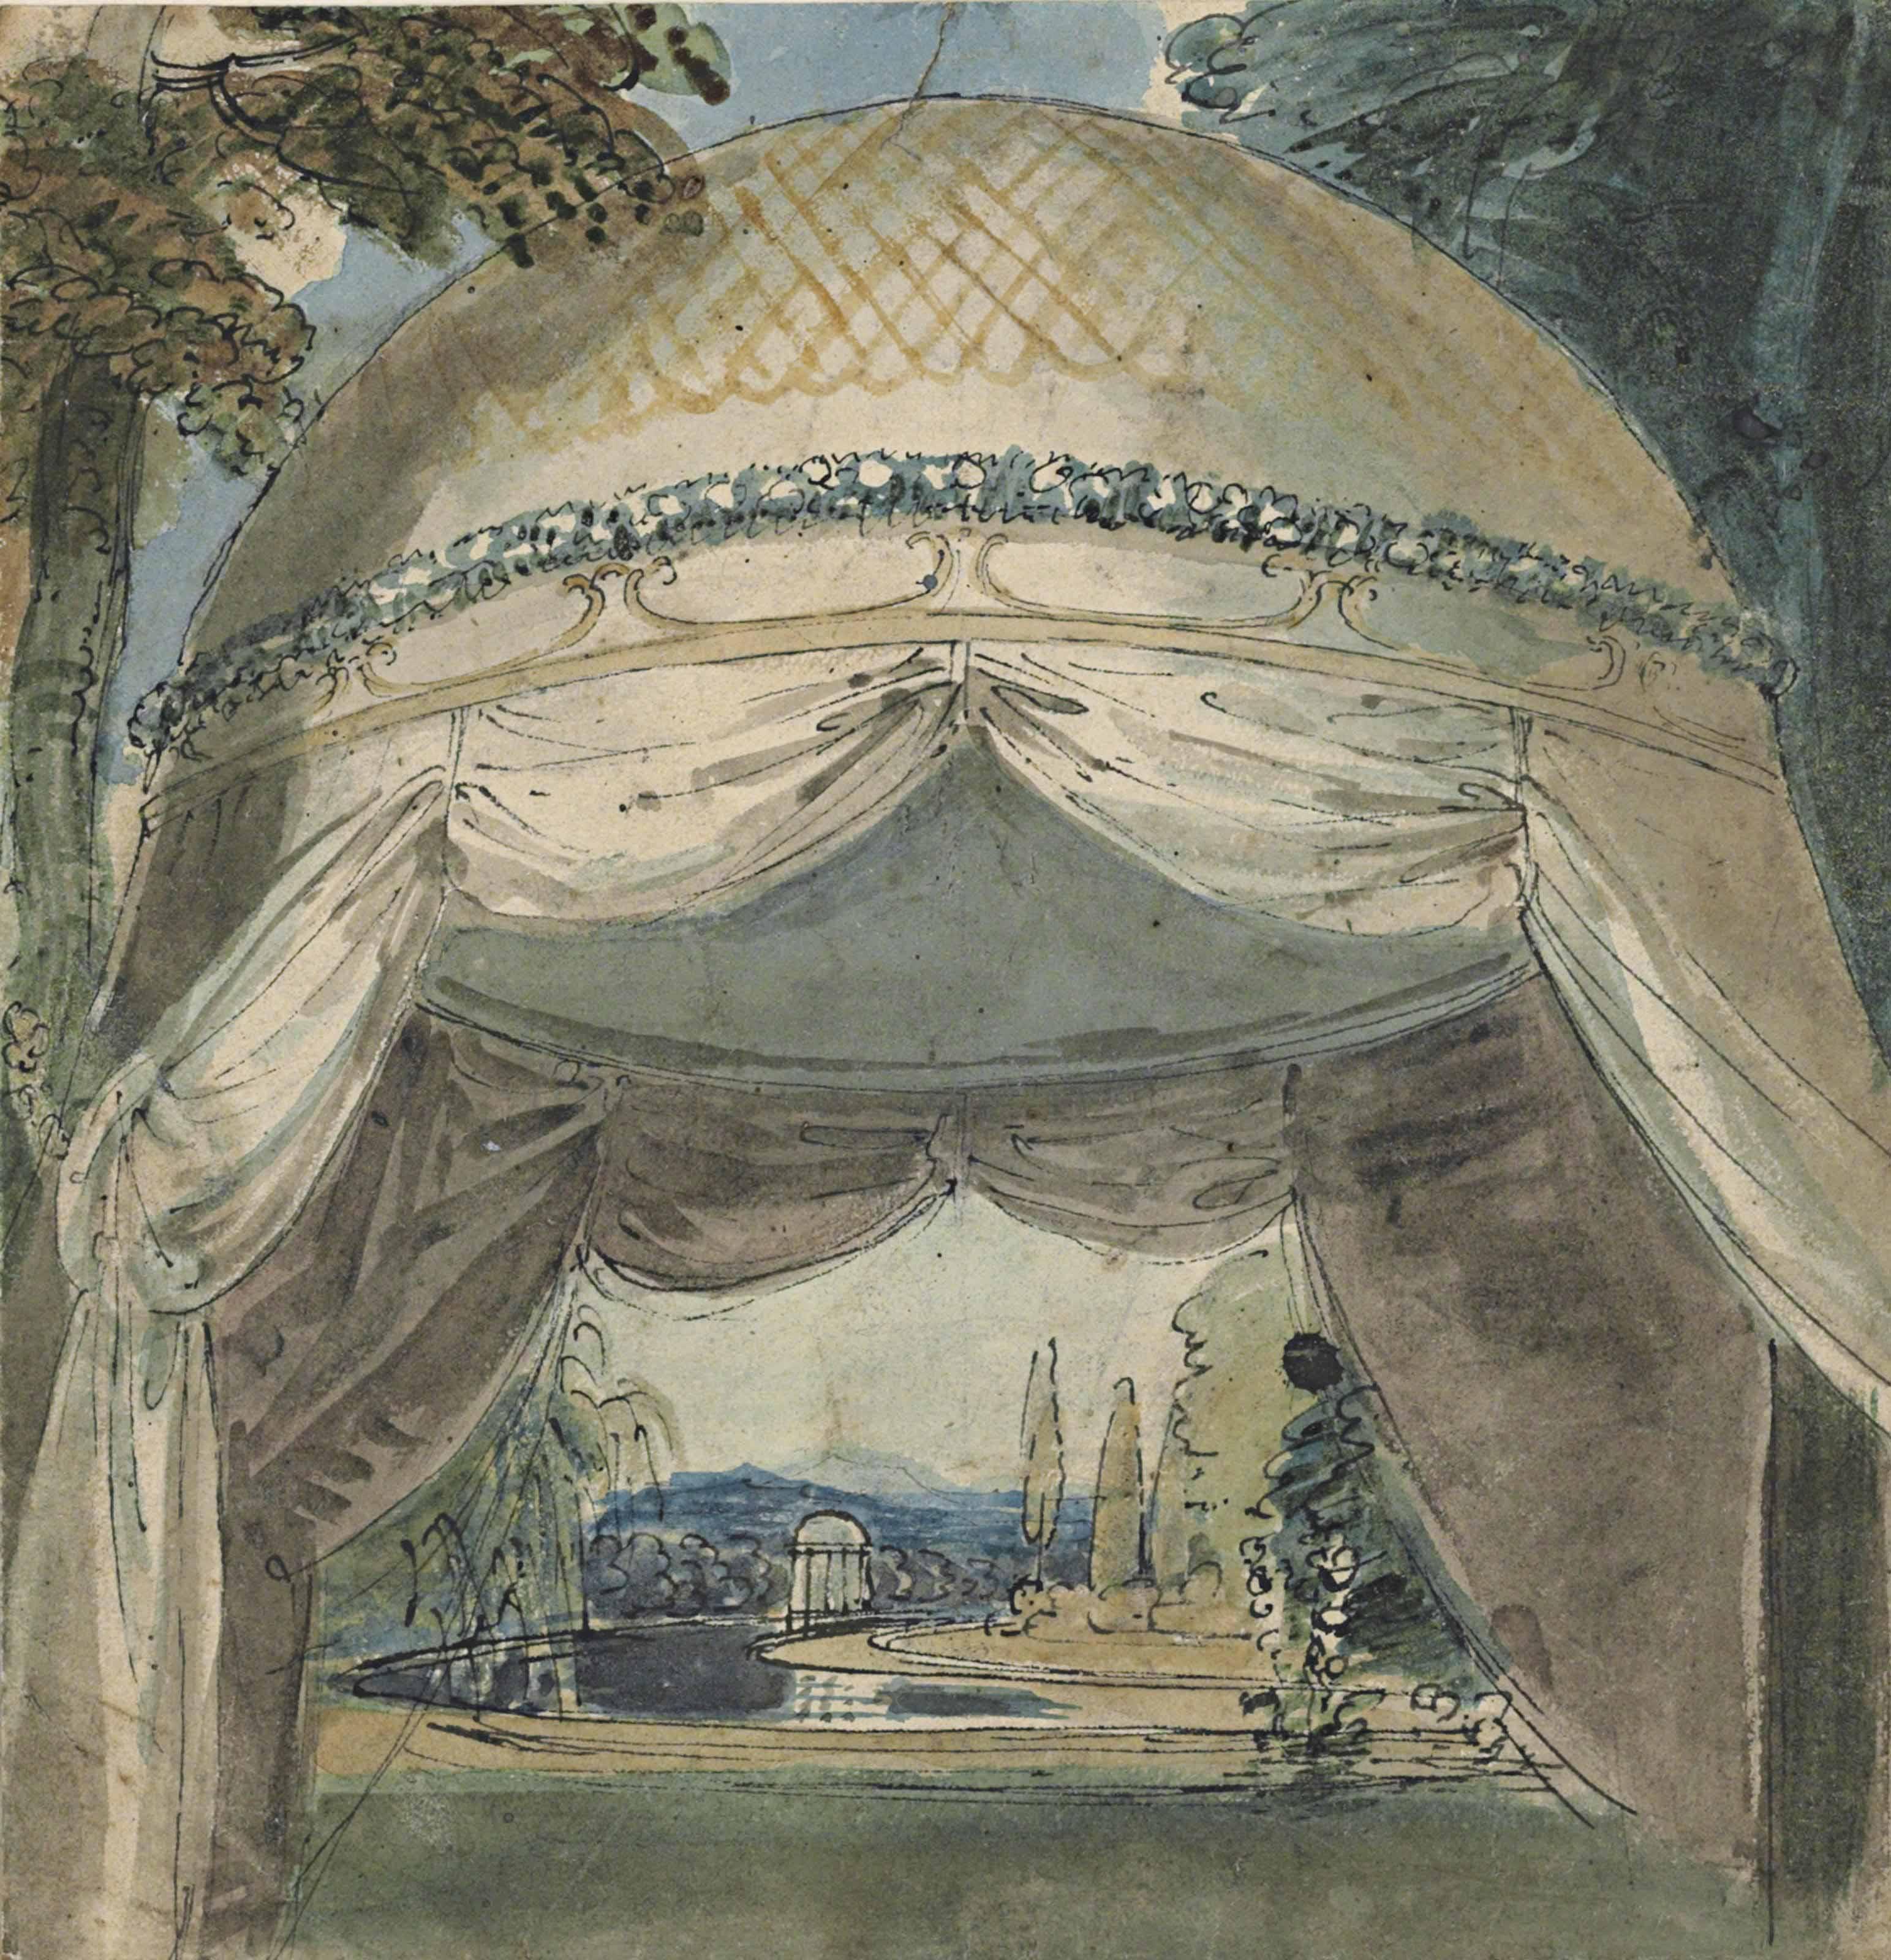 Thomas Stothard, R.A (London 1755-1834)